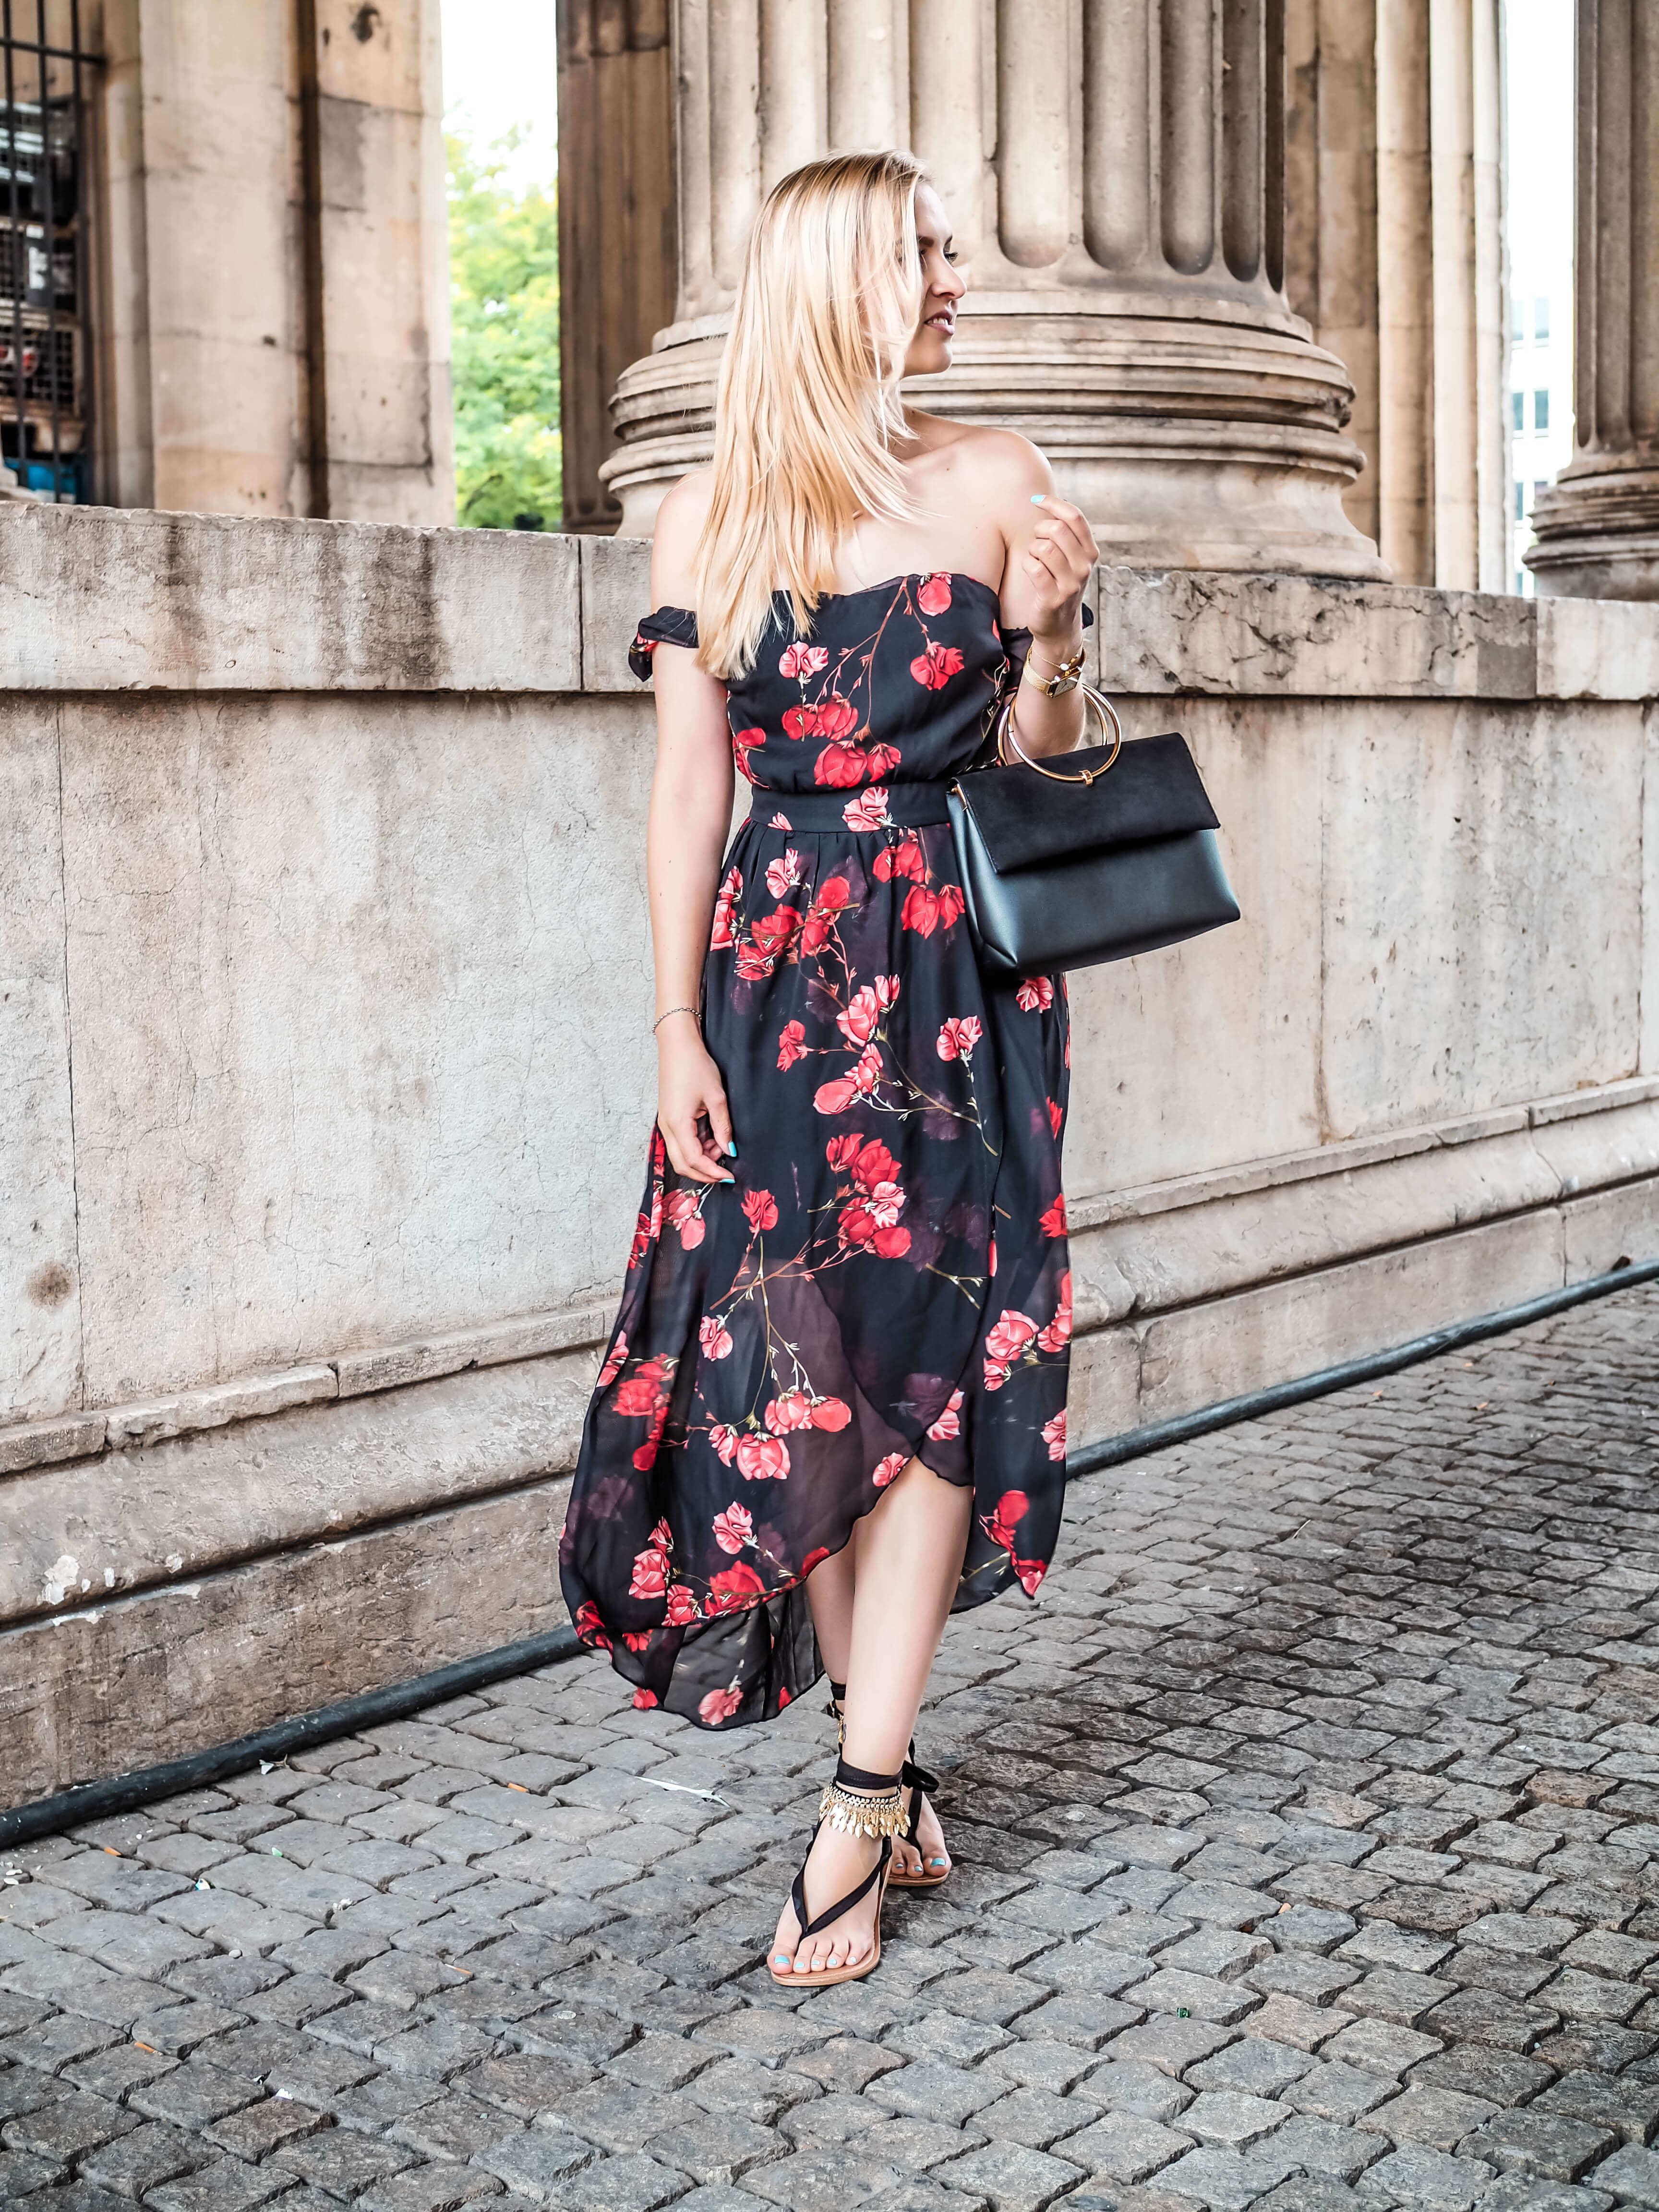 Maxikleid Midikleid Sommerkleid Katefully Kleid München Modeblog Fashionblog Modetipps Stylingtipps ootd lange Kleider Maxikleider